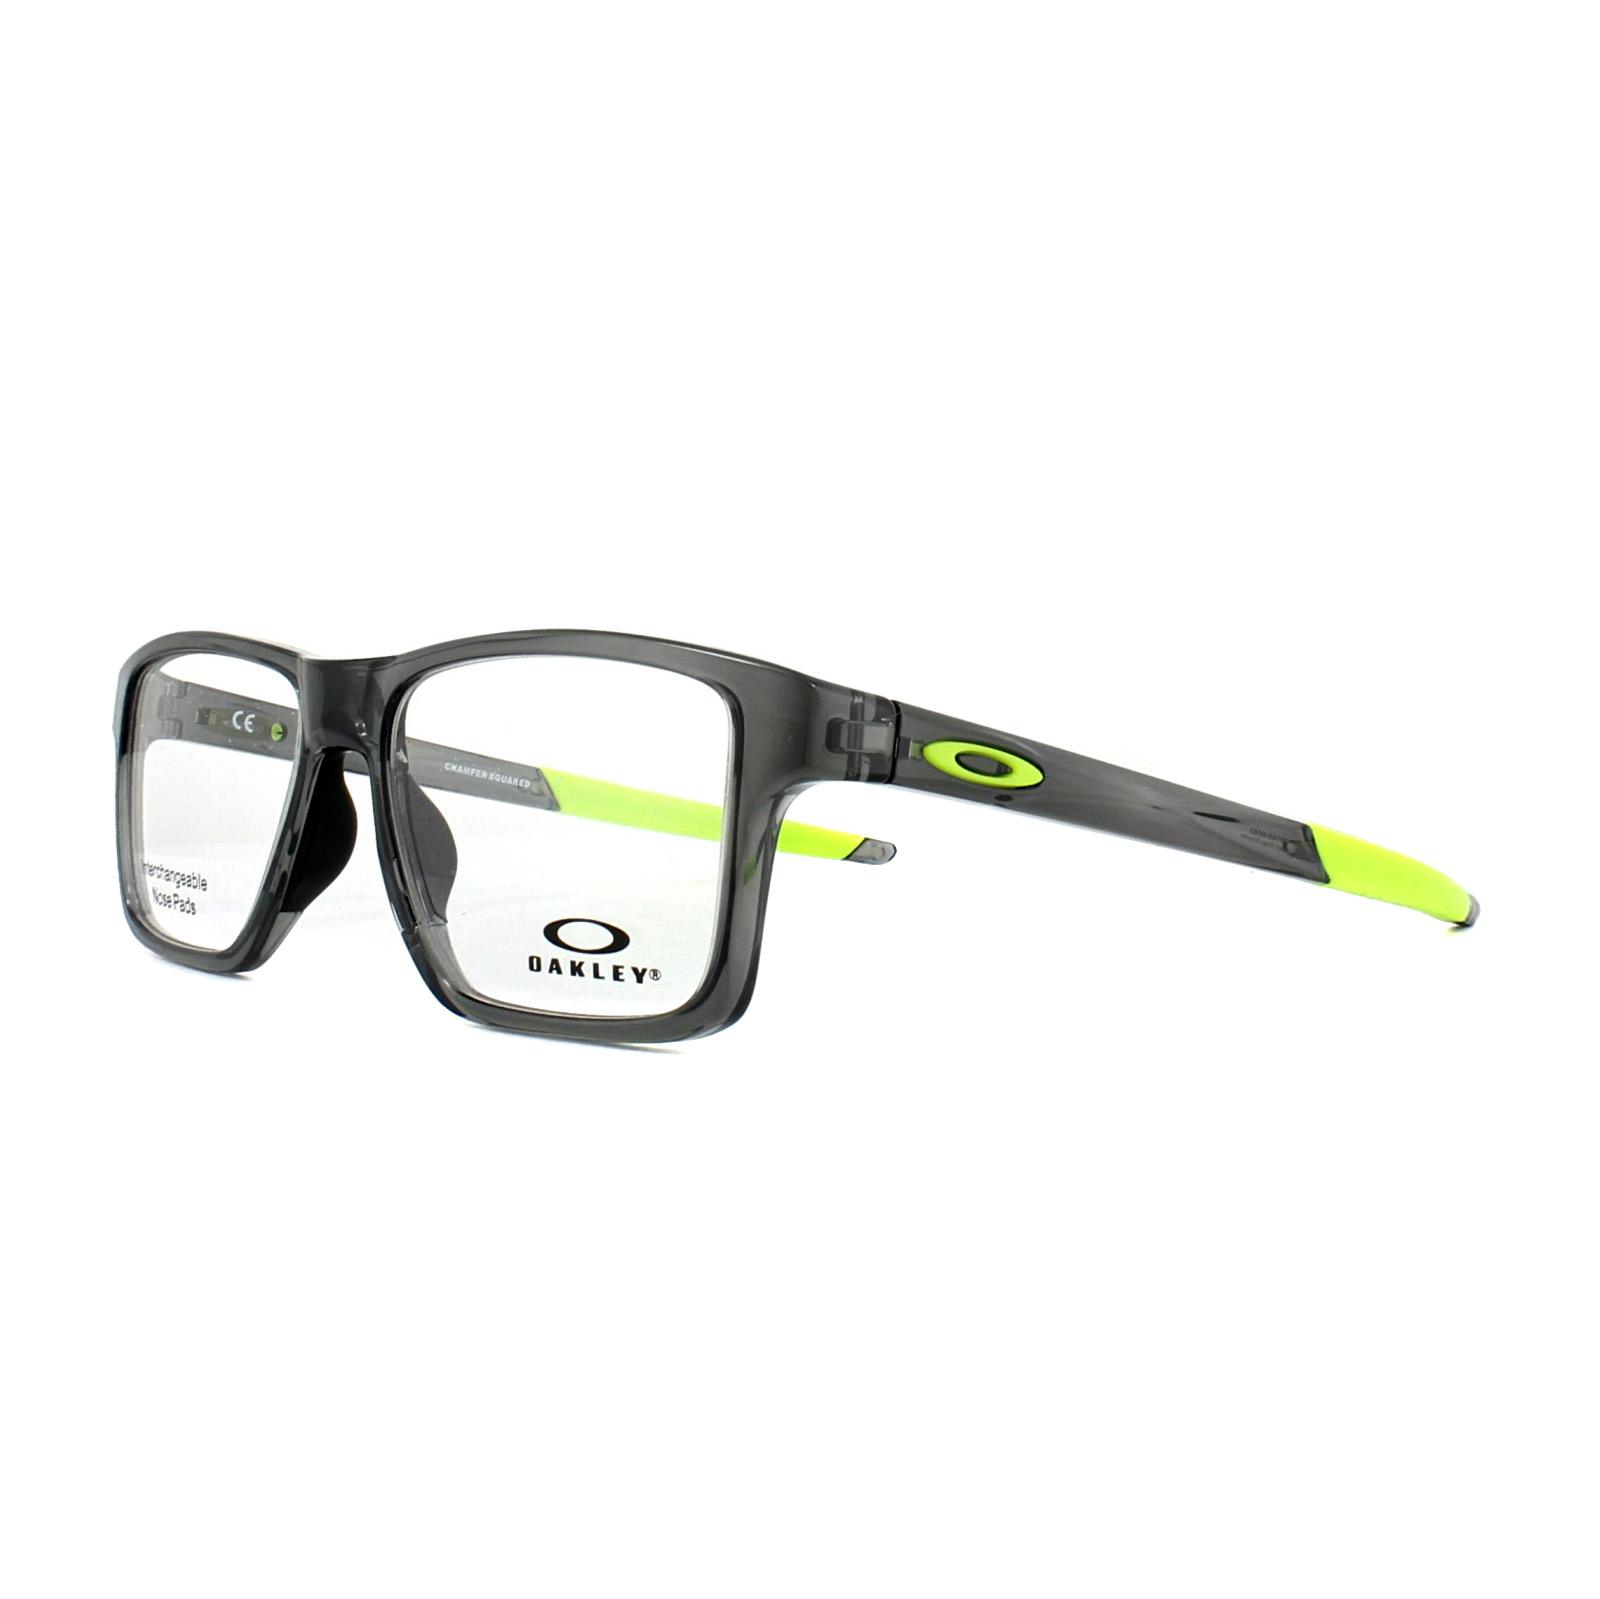 a614091830e Sentinel Oakley Glasses Frames Chamfer Squared OX8143-06 Polished Grey  Smoke 52mm Mens